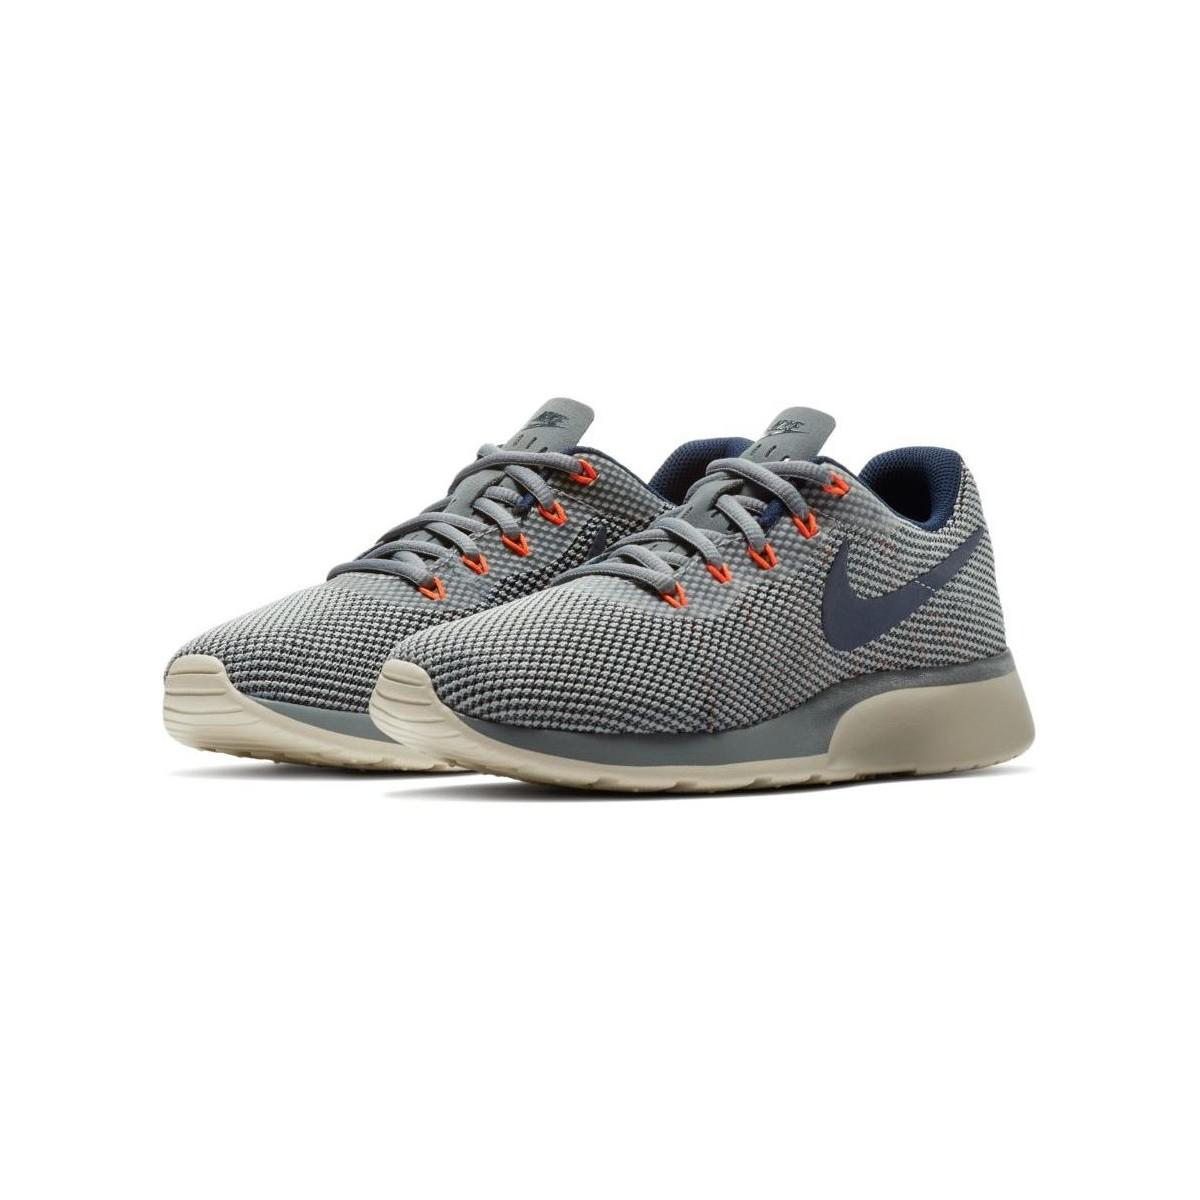 ... coupon nike gray tanjun racer womens shoes trainers in grey lyst. view  fullscreen 47ae4 1cd3d ... 278b045d2